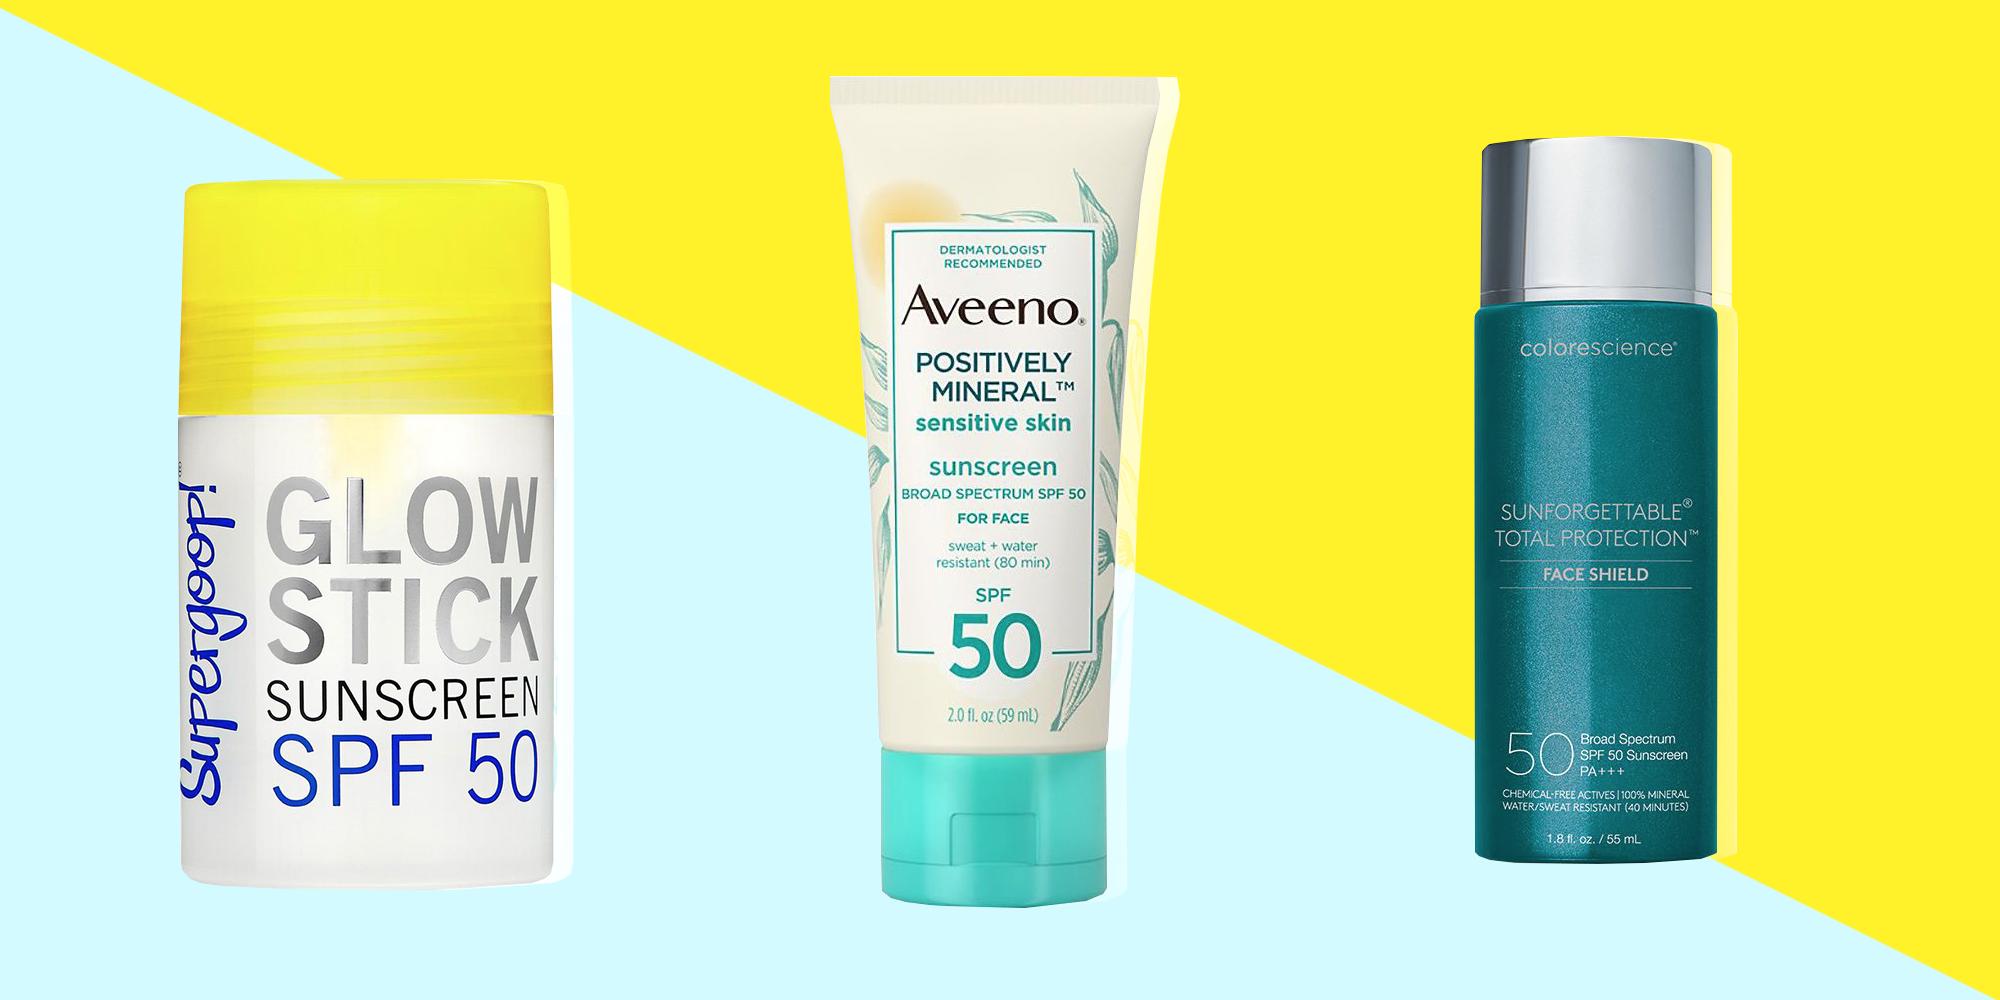 Best Facial Sunscreen Spf 50 For Face